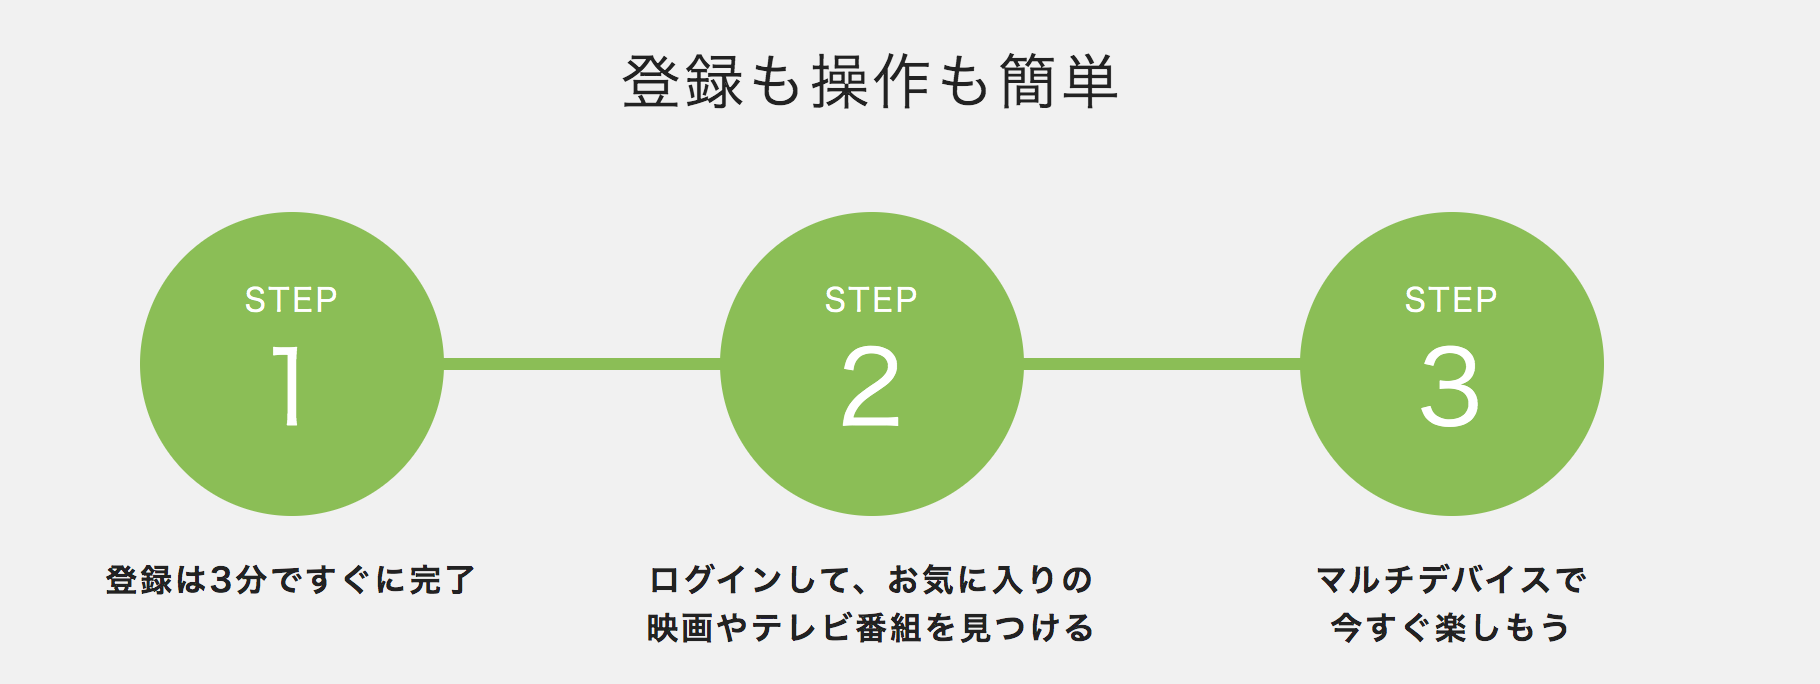 Hulu_無料トライアル申し込み方法